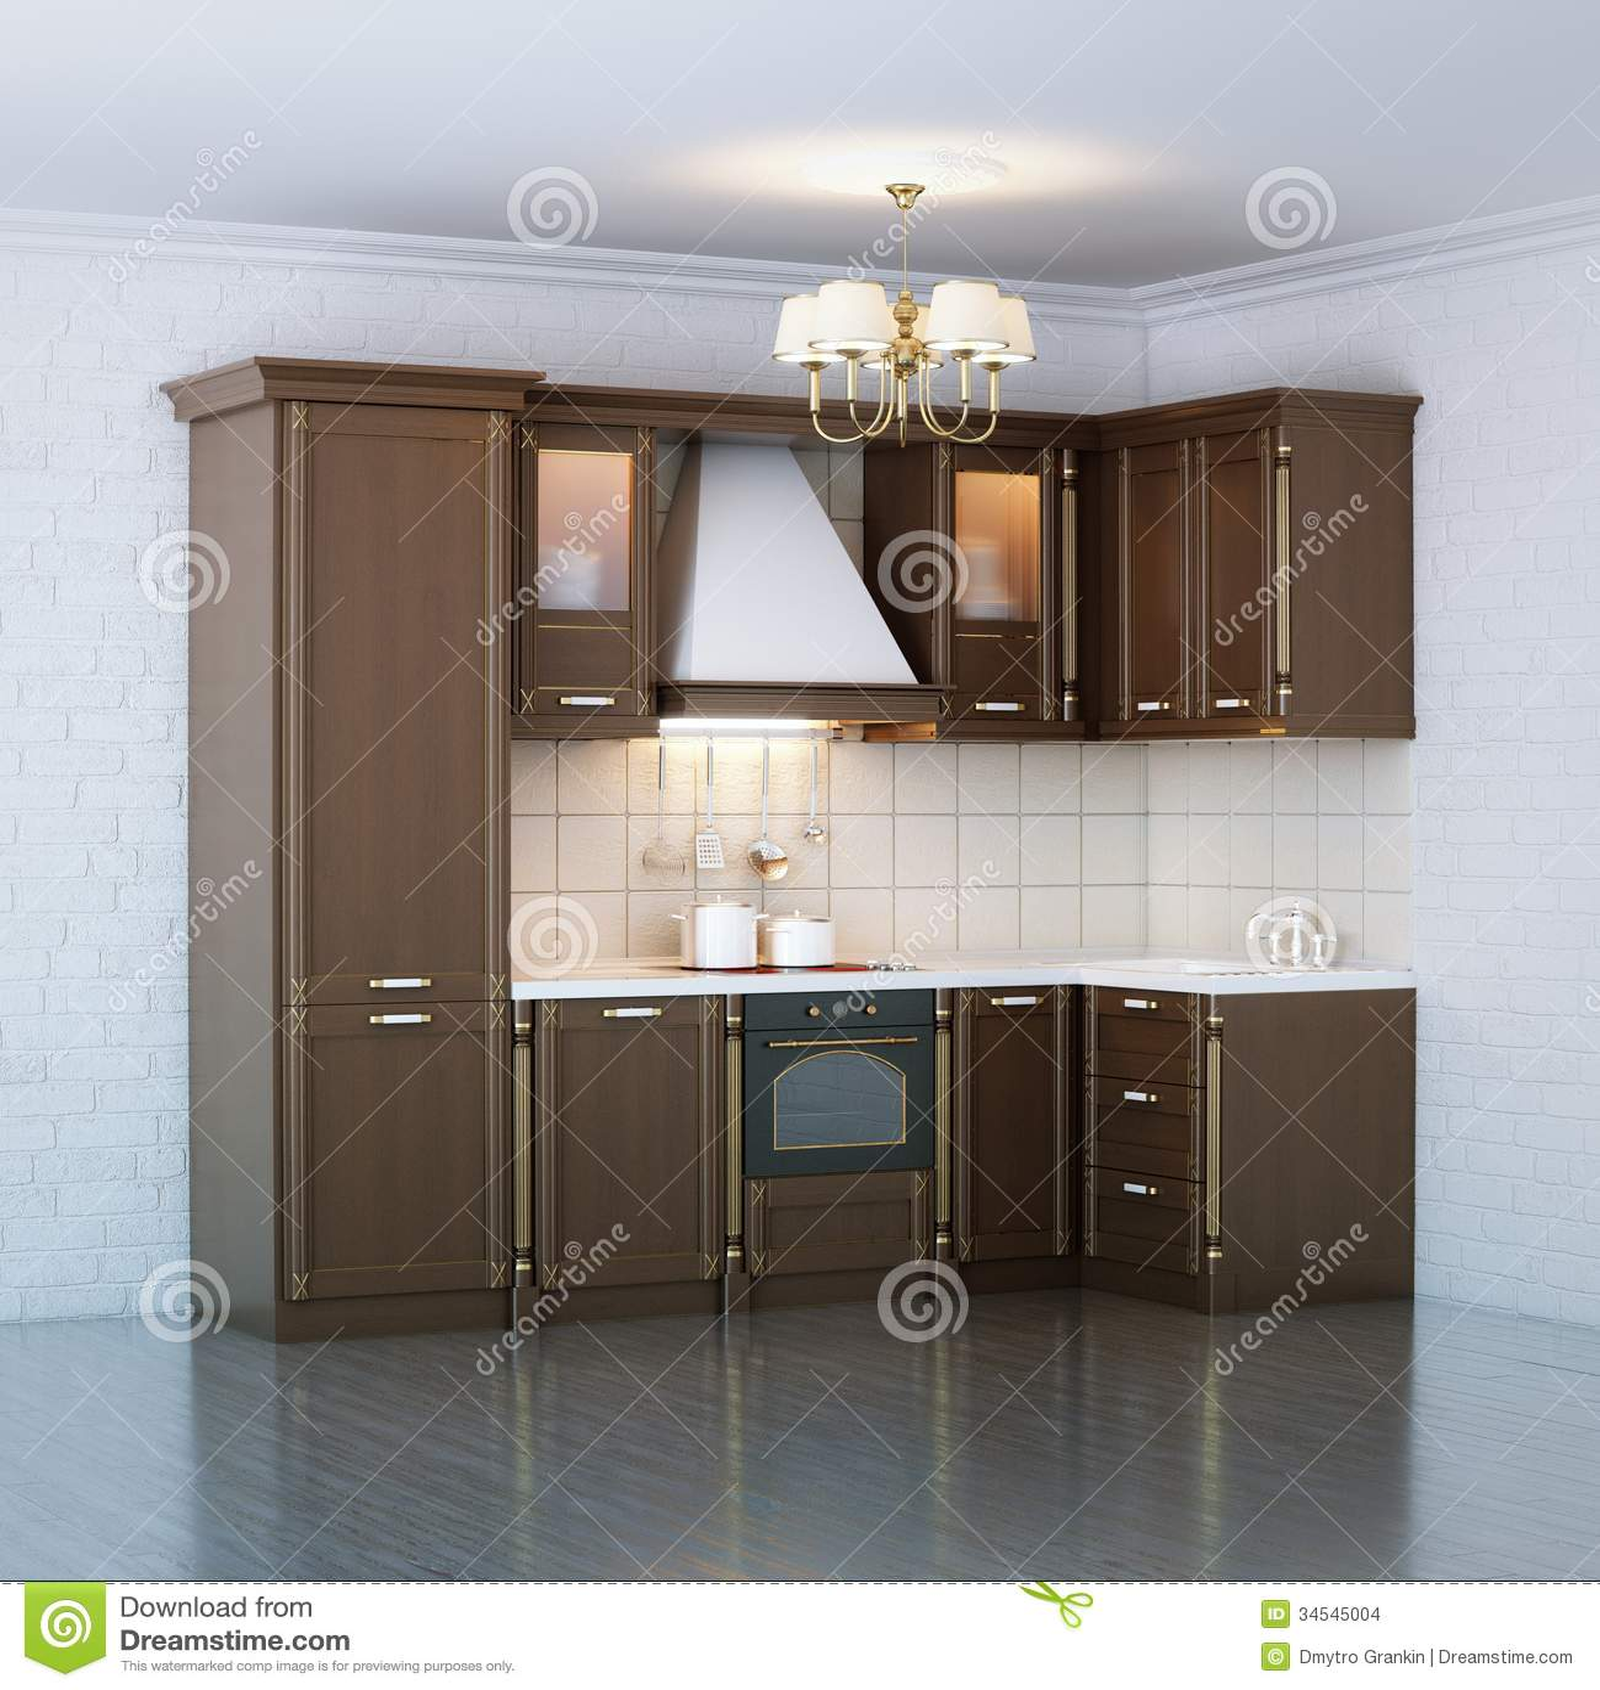 armadio da cucina di legno di lusso immagini stock - immagine ... - Cucina Di Design Armadio Di Lusso